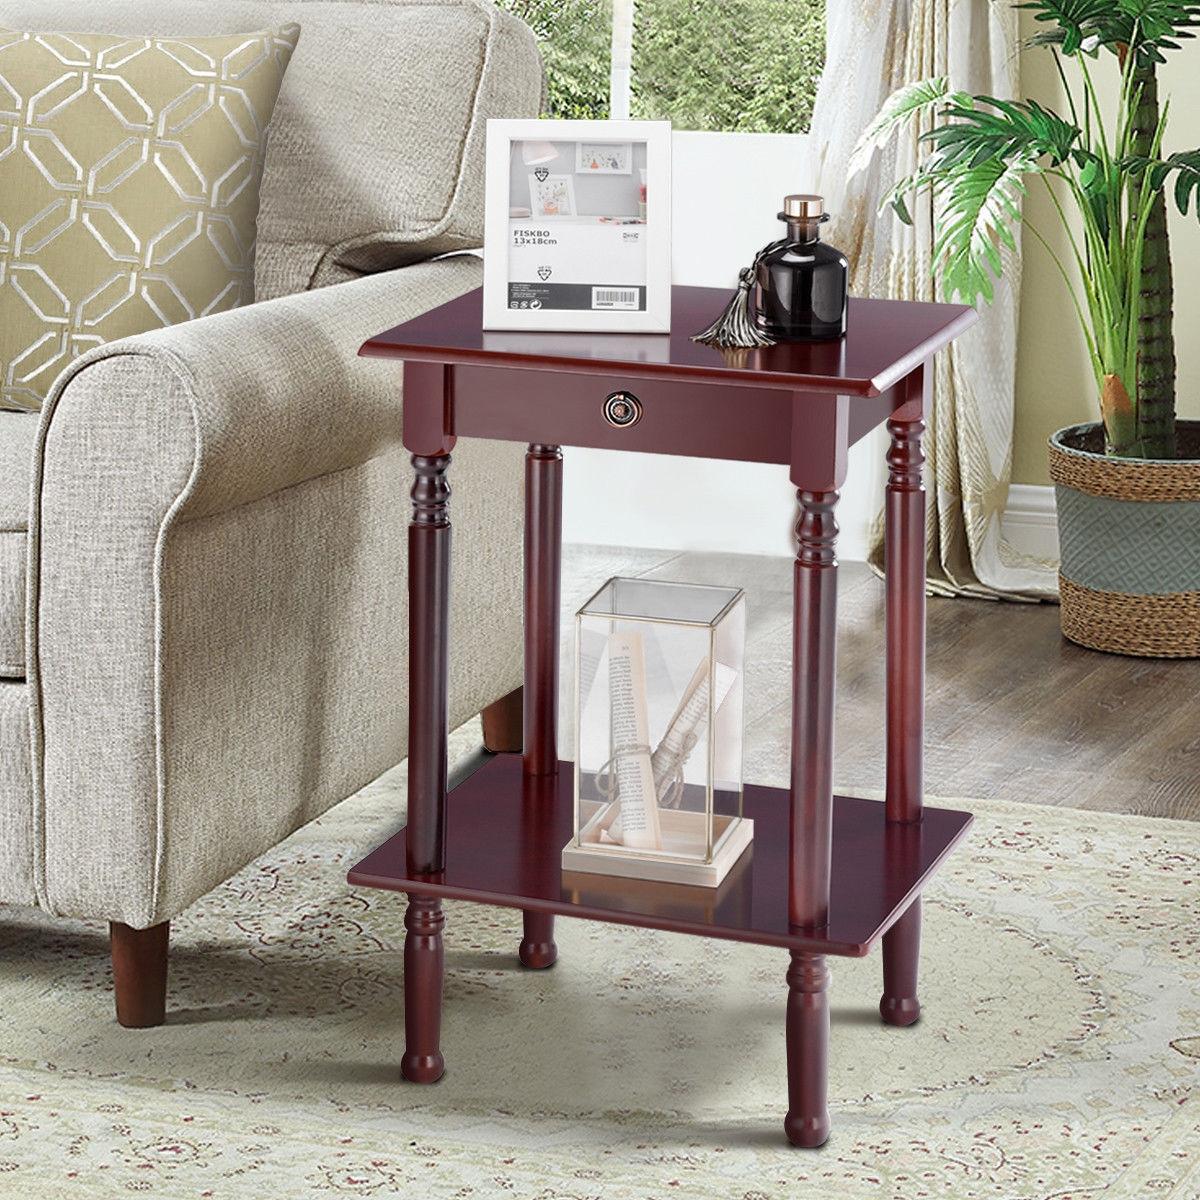 Tall Telephone Stand Side Shelf Table